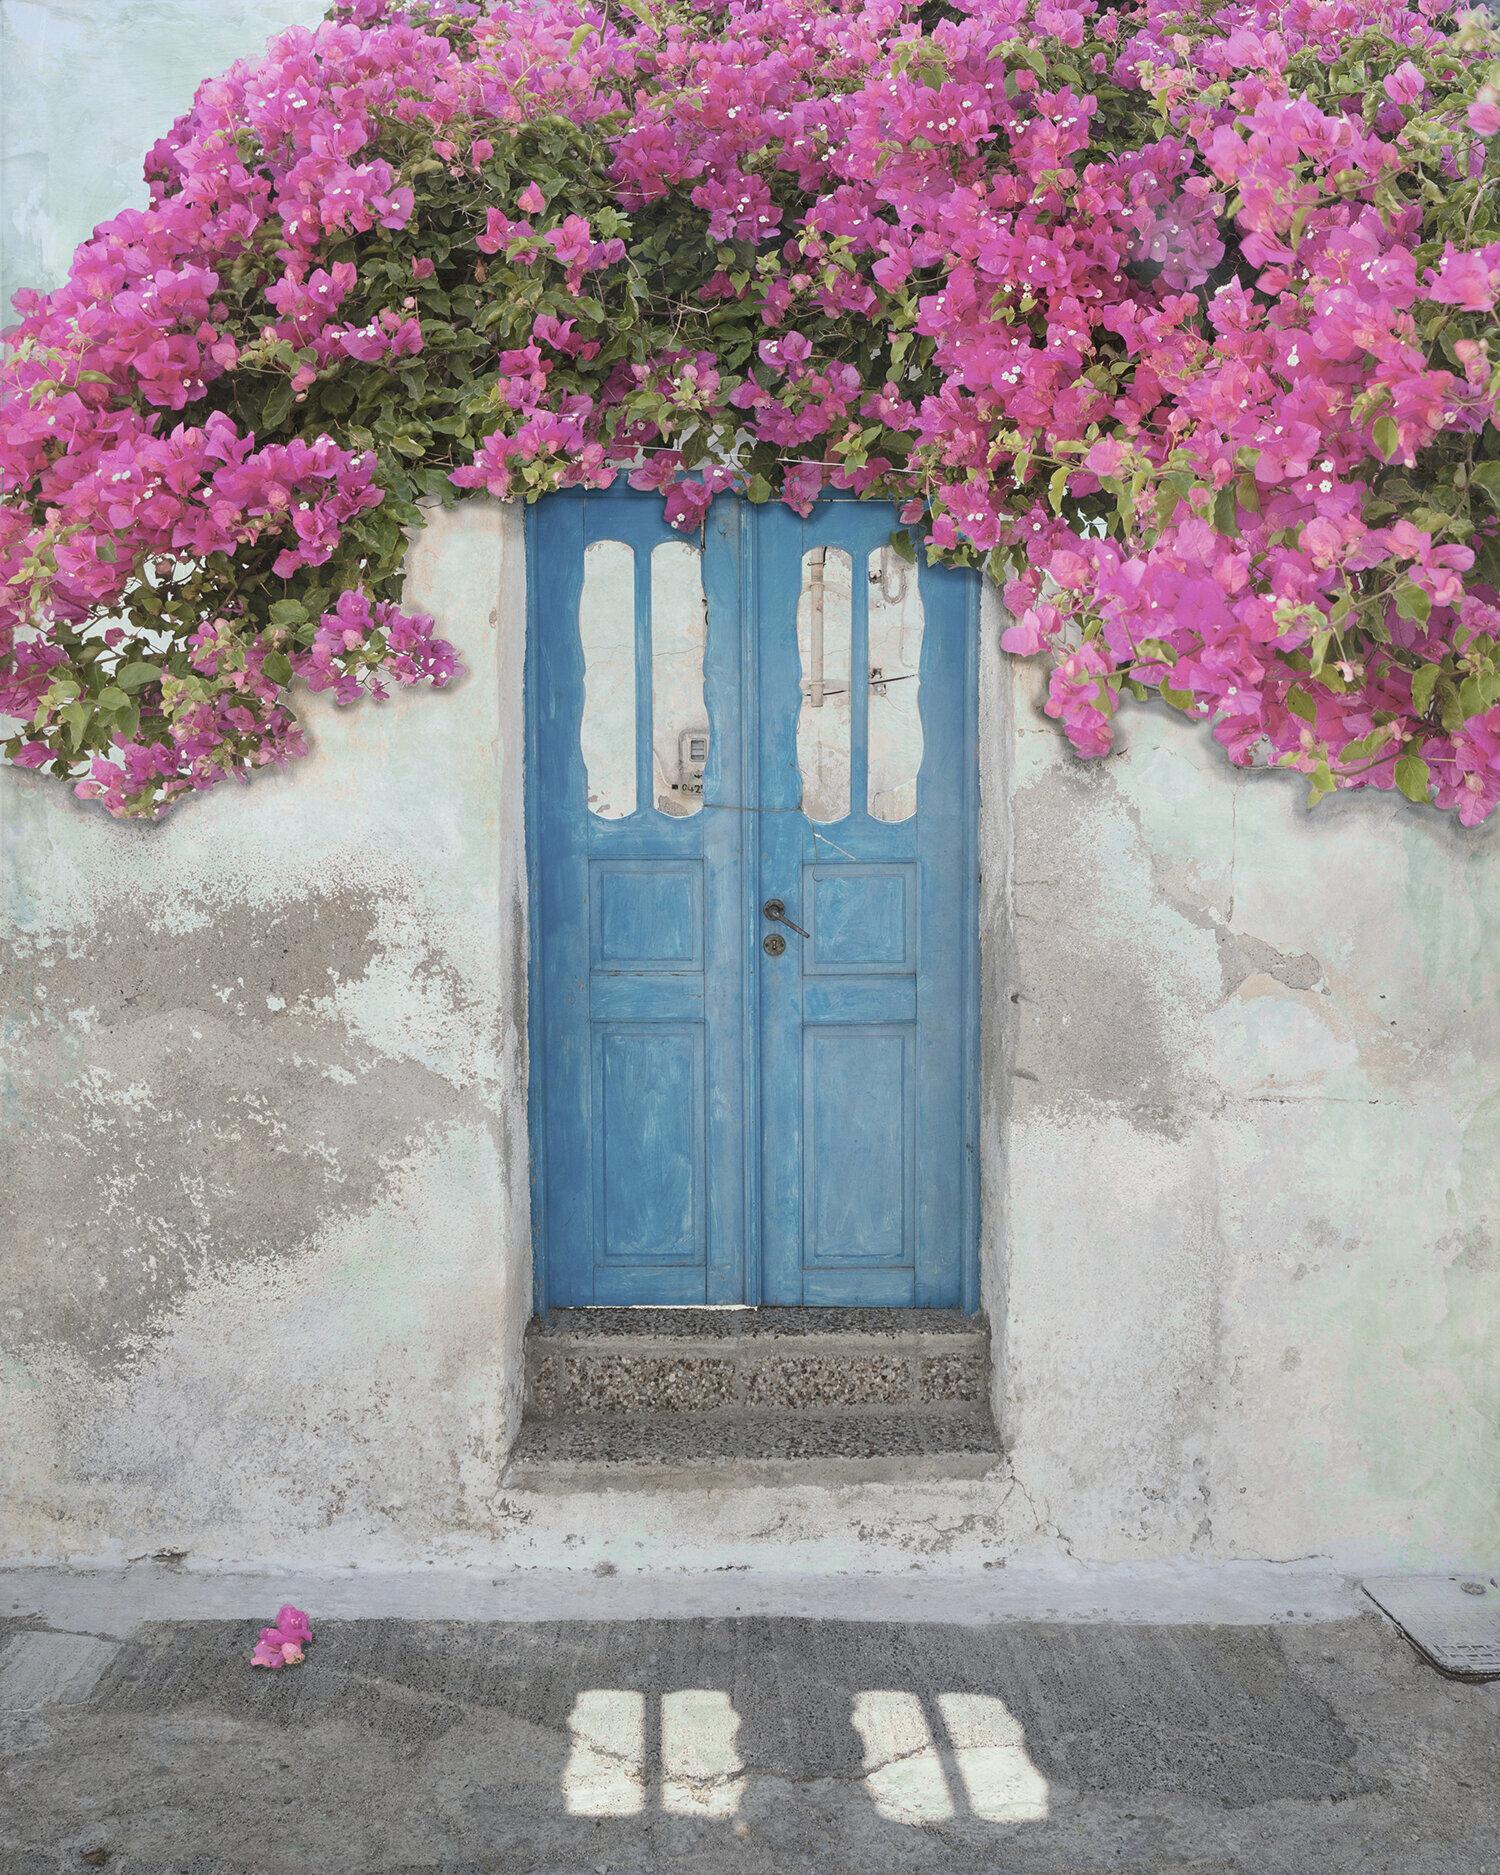 Blue Doors and Bougainvillea, Santorini